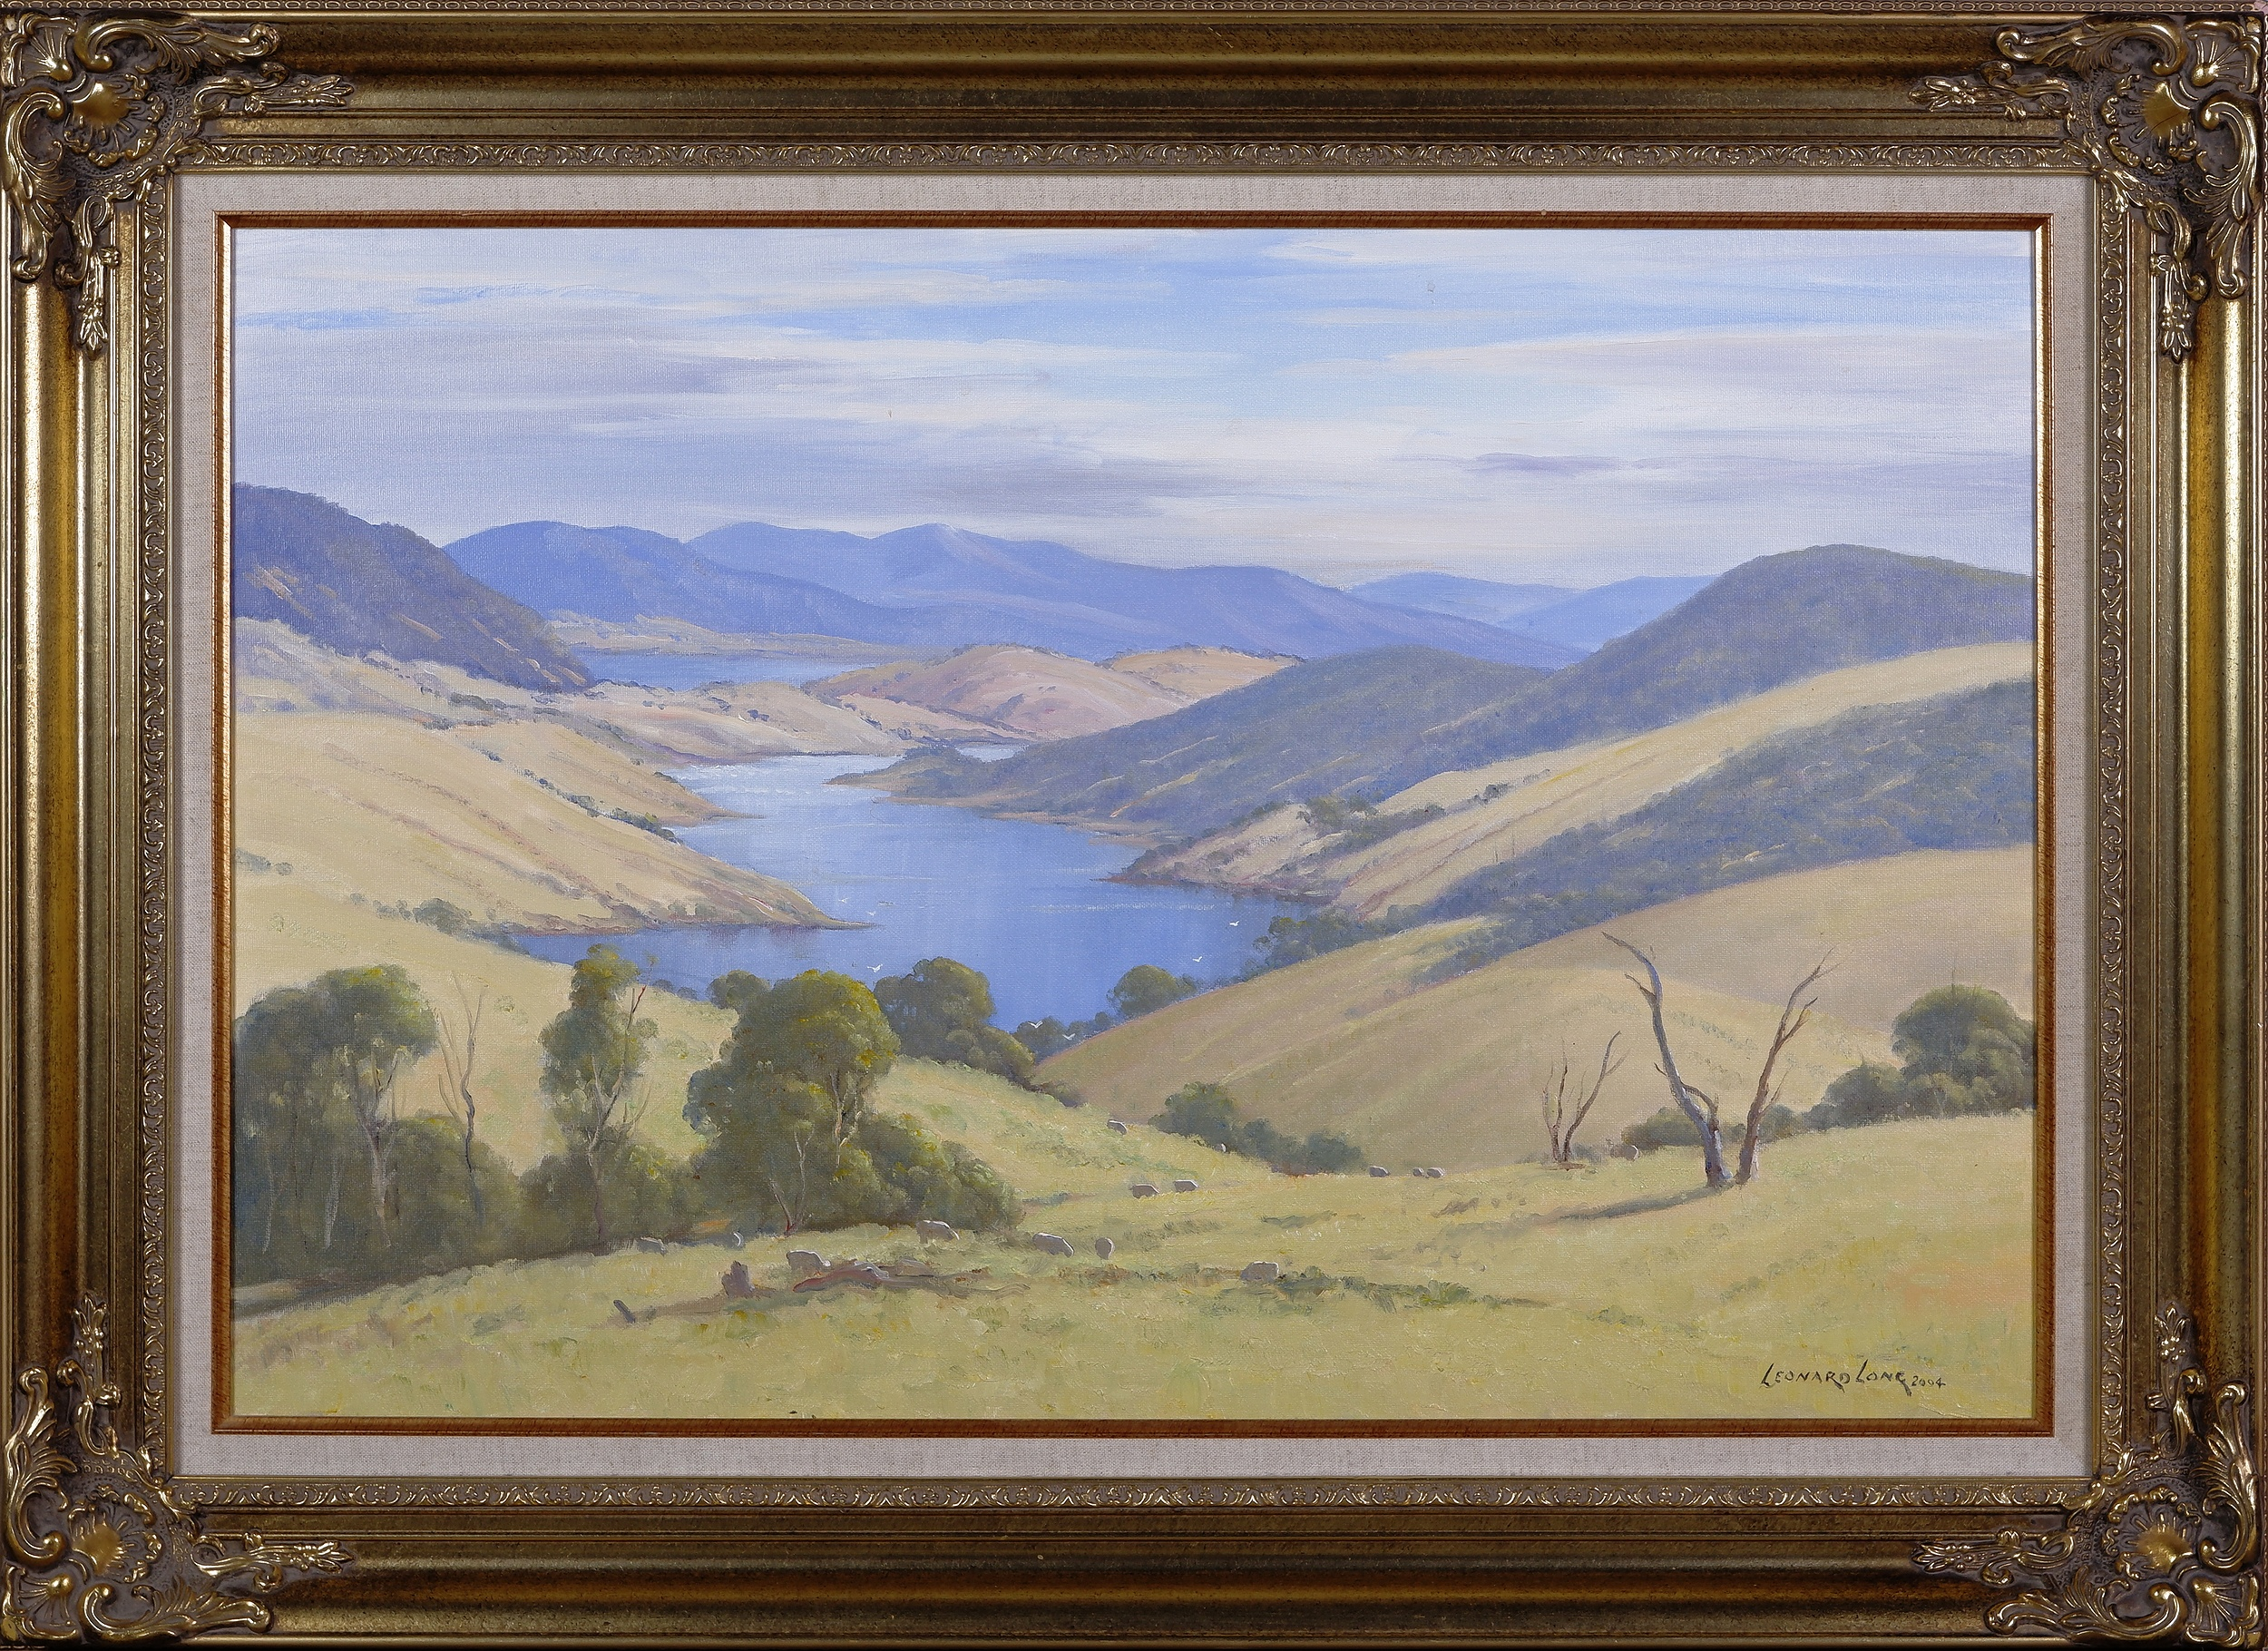 'Leonard Long (1911-2013), Across the Goodradigbee, Wee Jasper, New South Wales 2004, Oil on Canvas on Board'